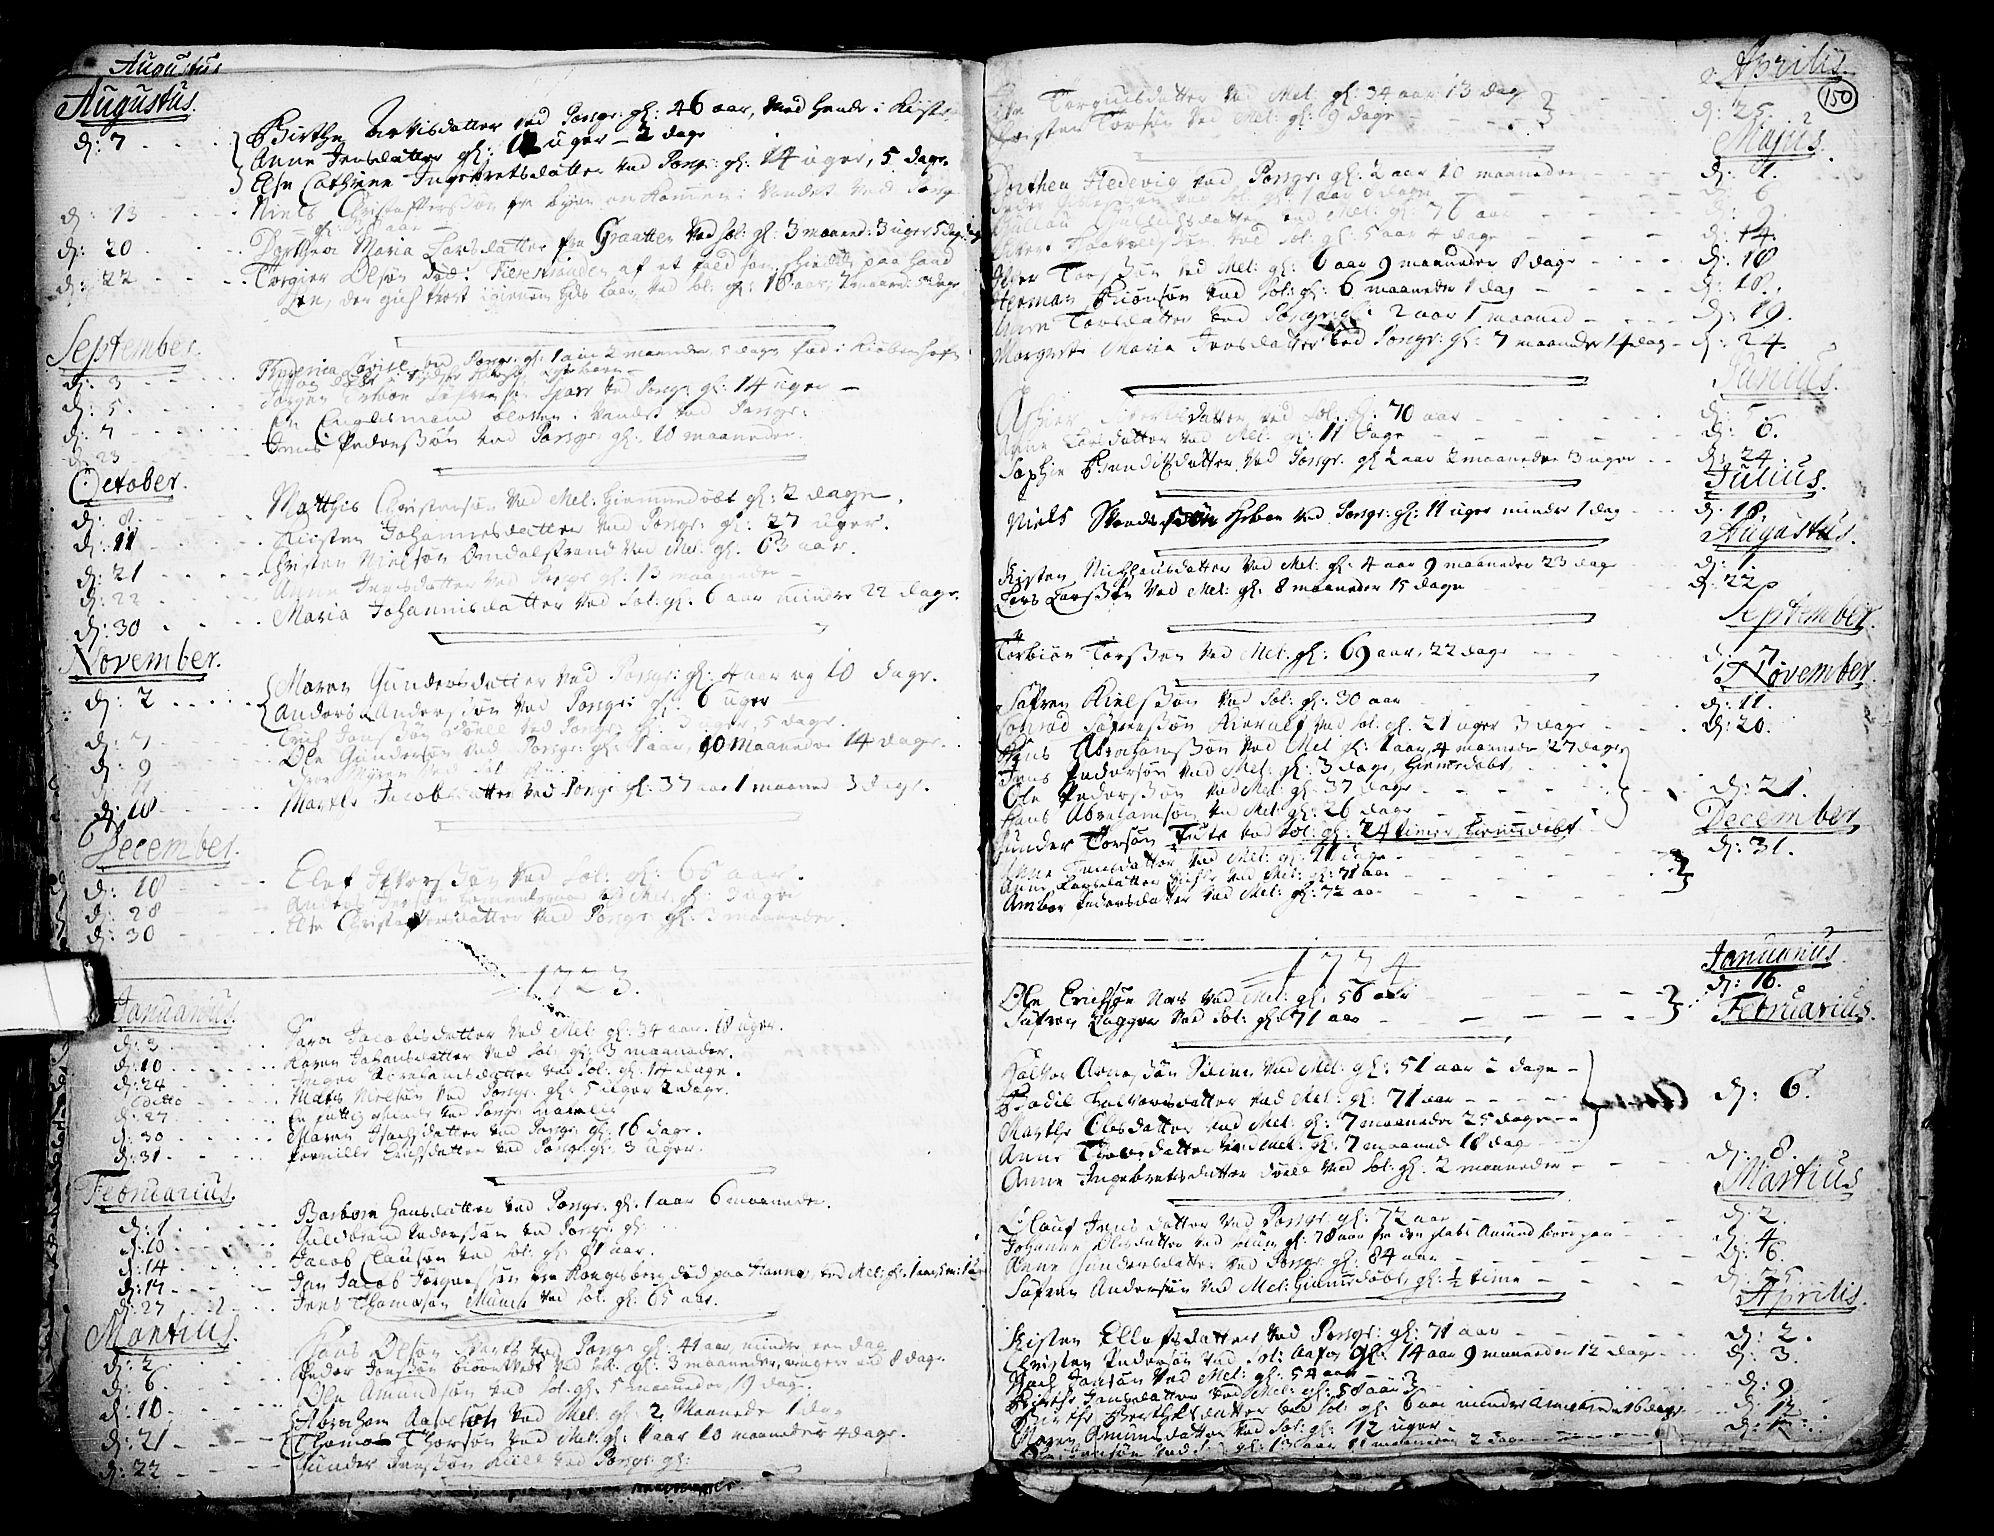 SAKO, Solum kirkebøker, F/Fa/L0002: Ministerialbok nr. I 2, 1713-1761, s. 150